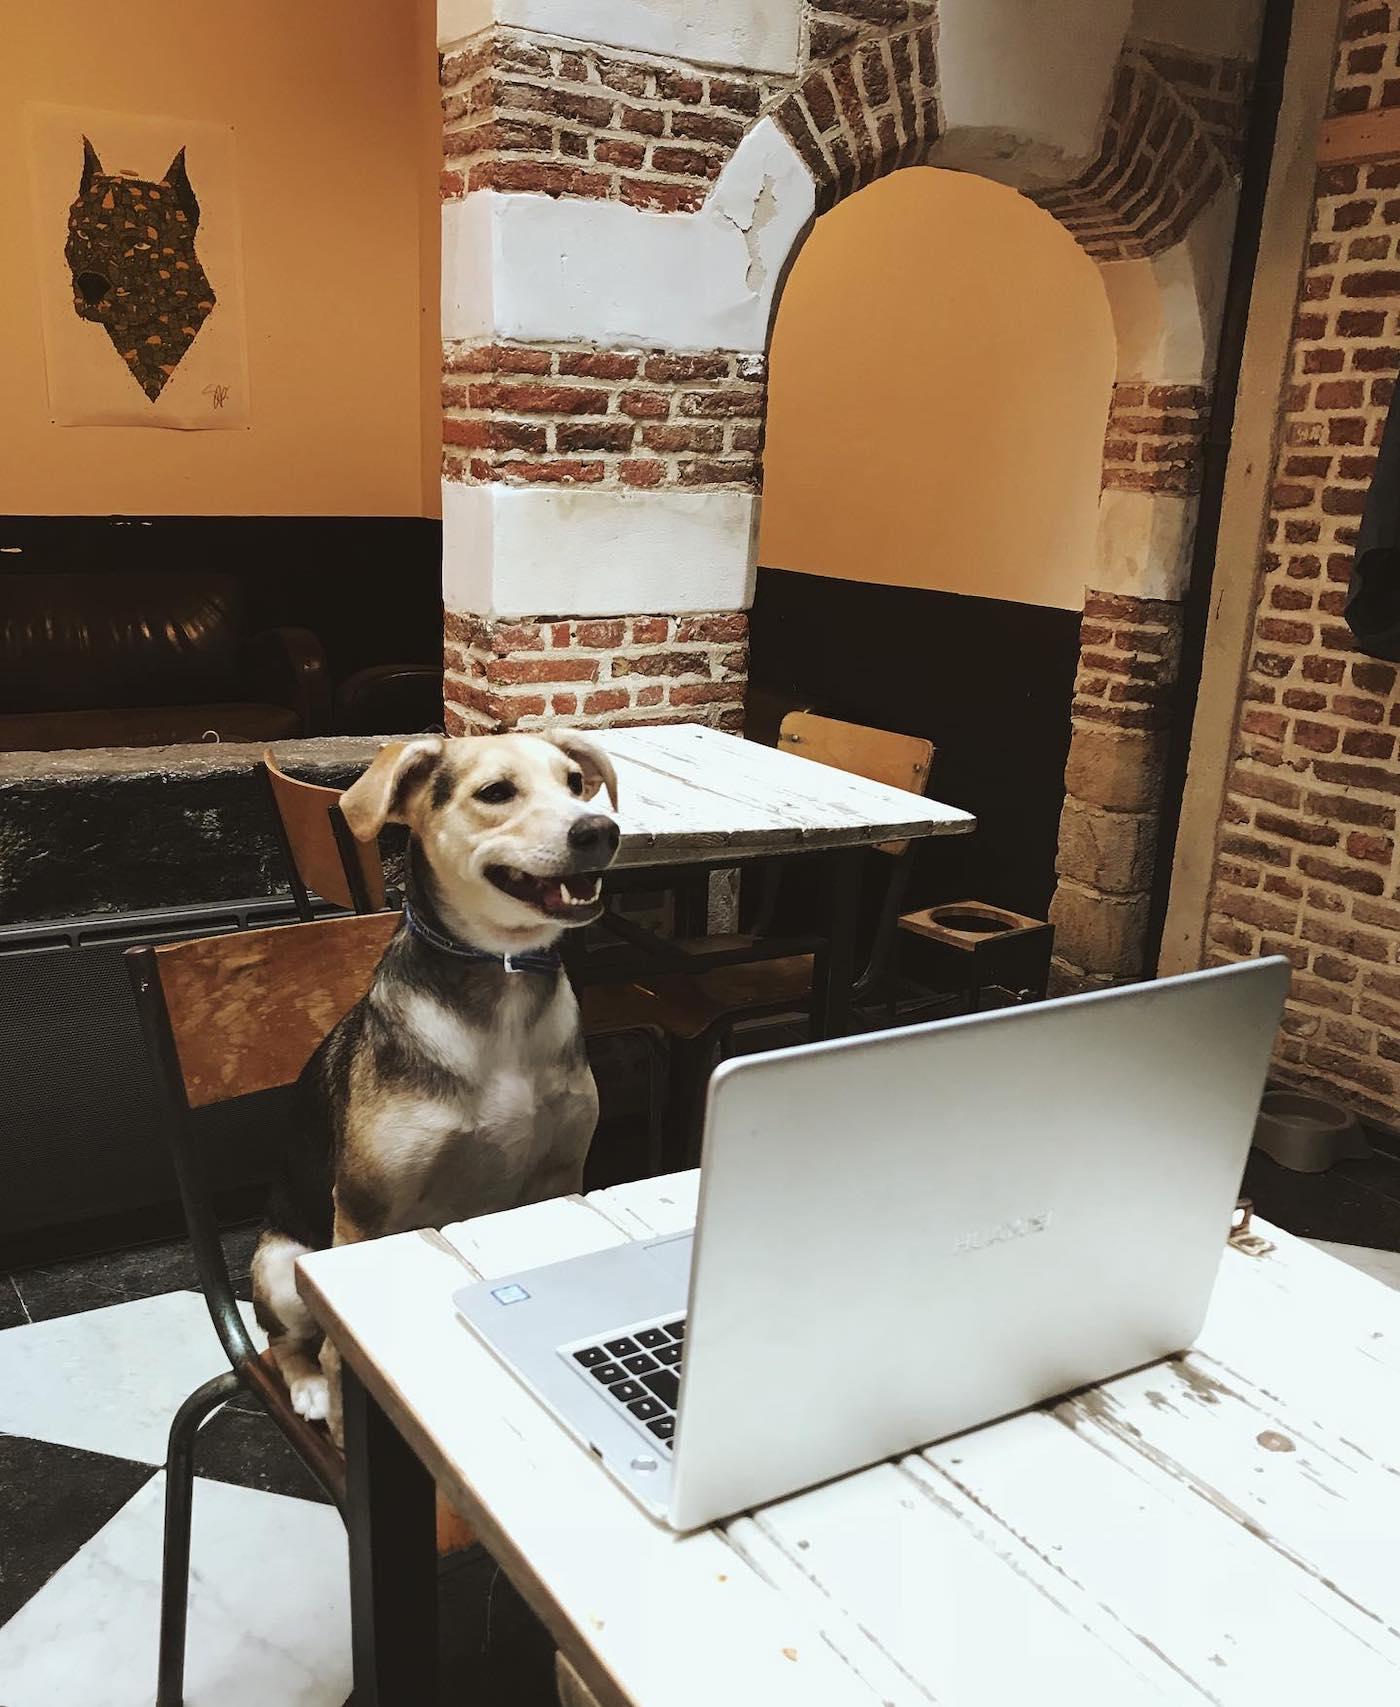 https://i1.wp.com/creapills.com/wp-content/uploads/2019/11/lille-waf-cafe-chiens-adoption-7.jpg?w=1400&ssl=1